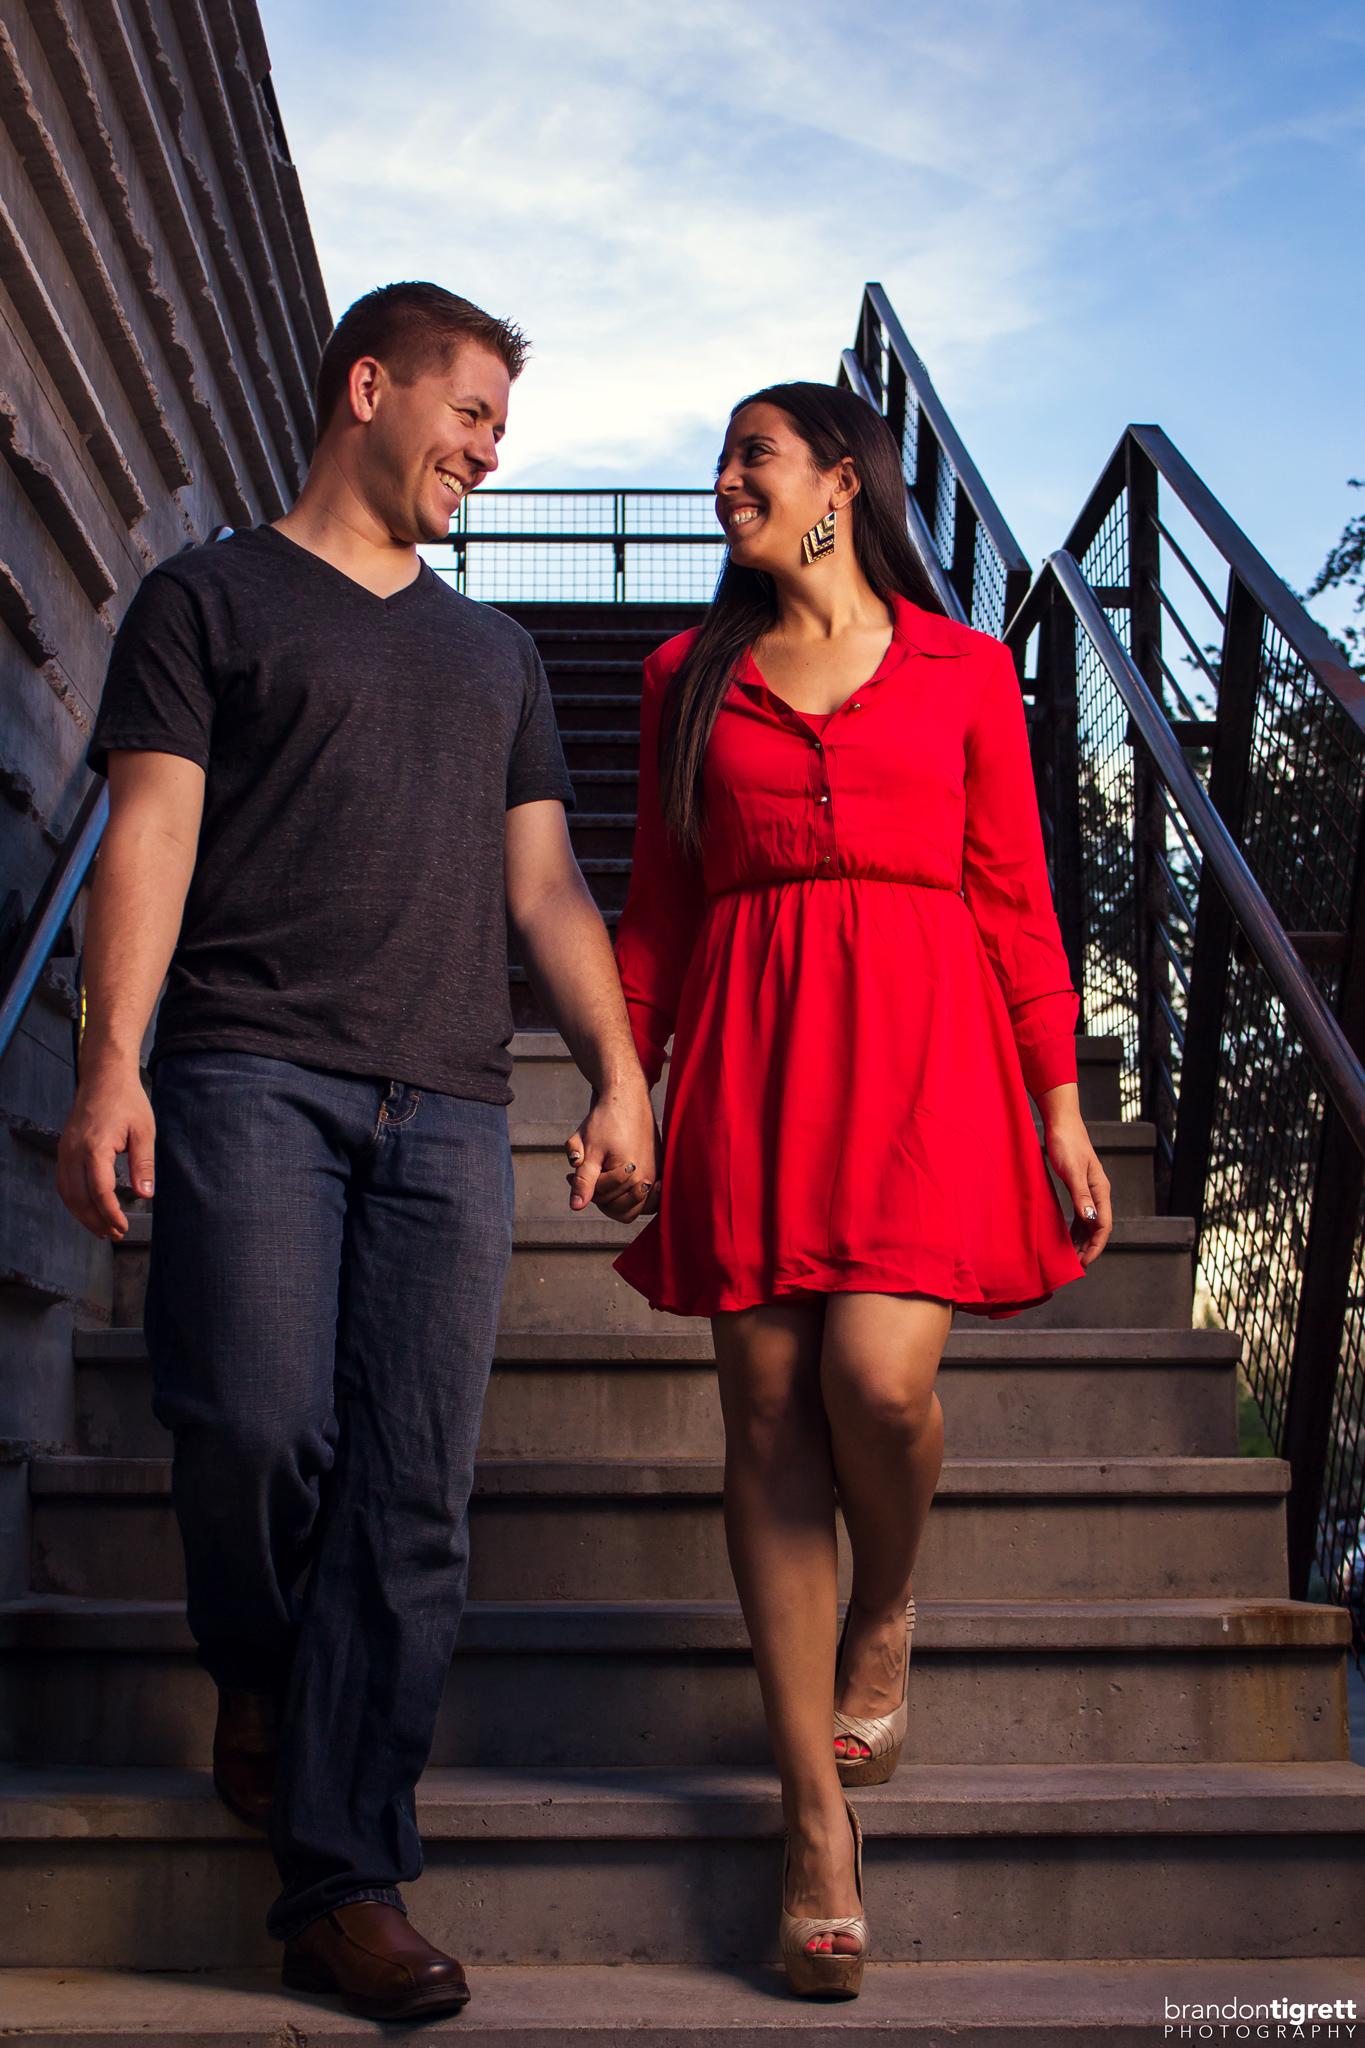 2014_Brandon-Tigrett_Scottsdale_couple_Caraline-Jackson-129_WEB